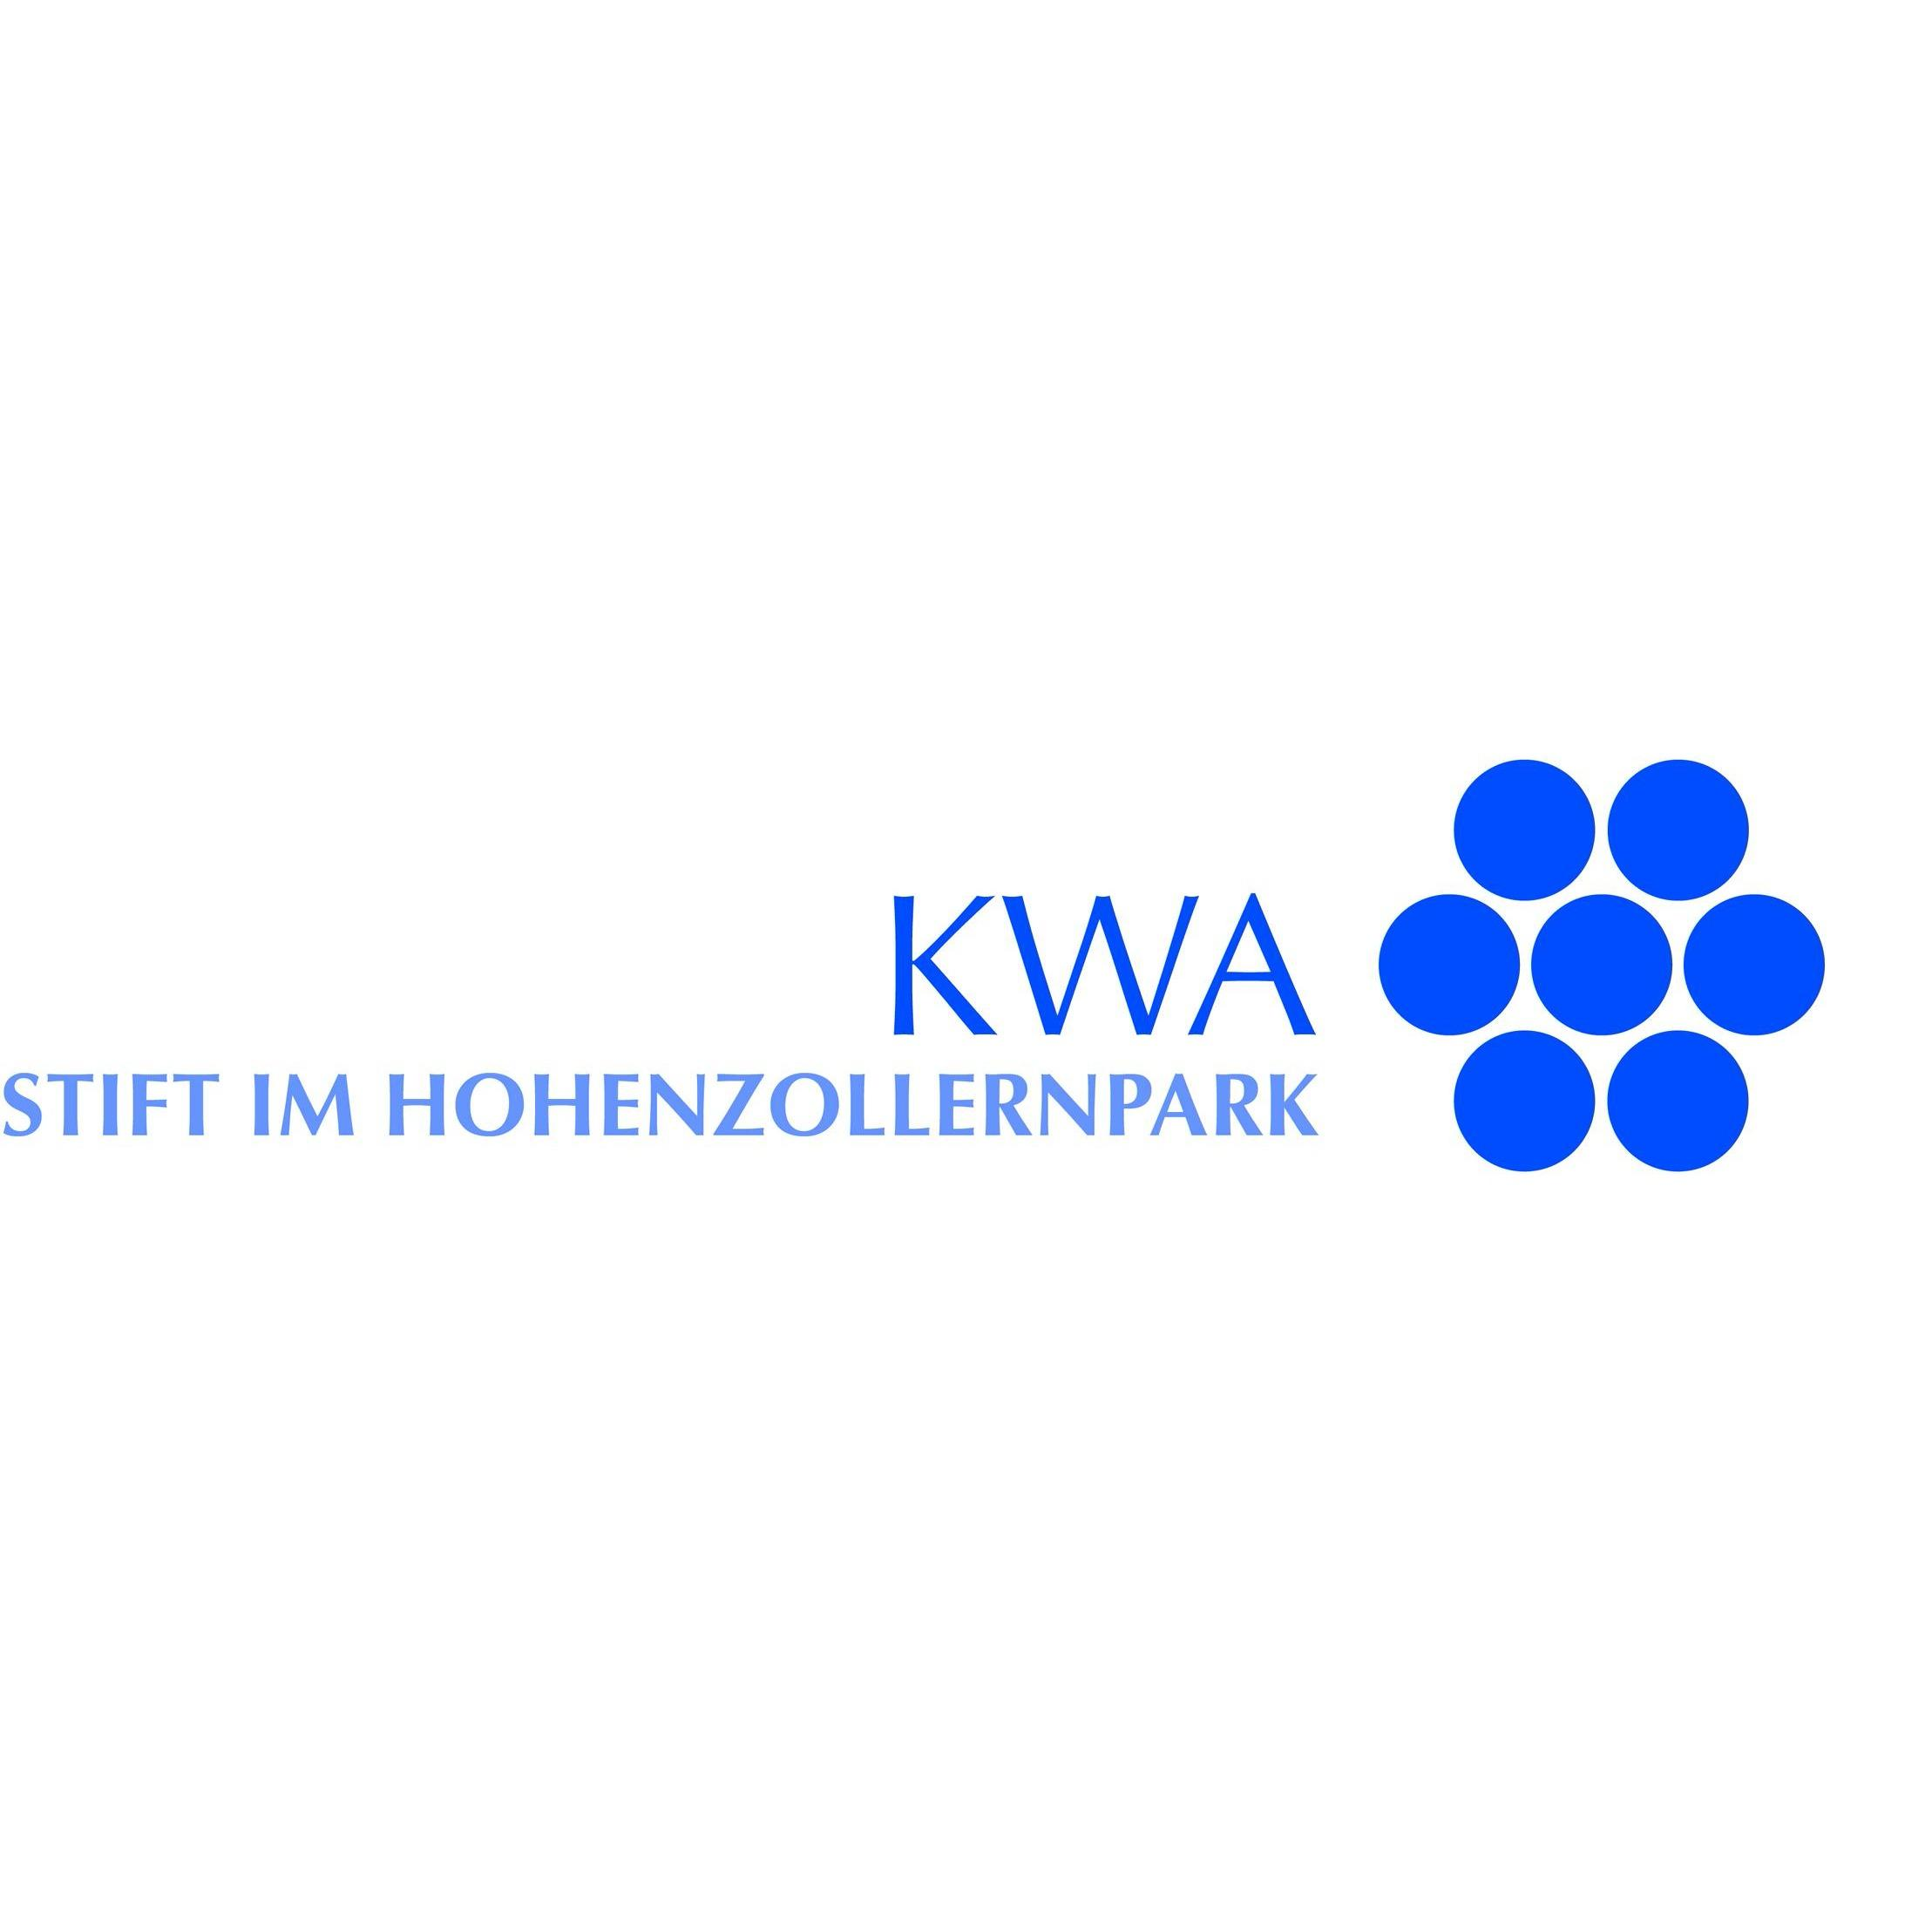 Bild zu KWA Stift im Hohenzollernpark in Berlin